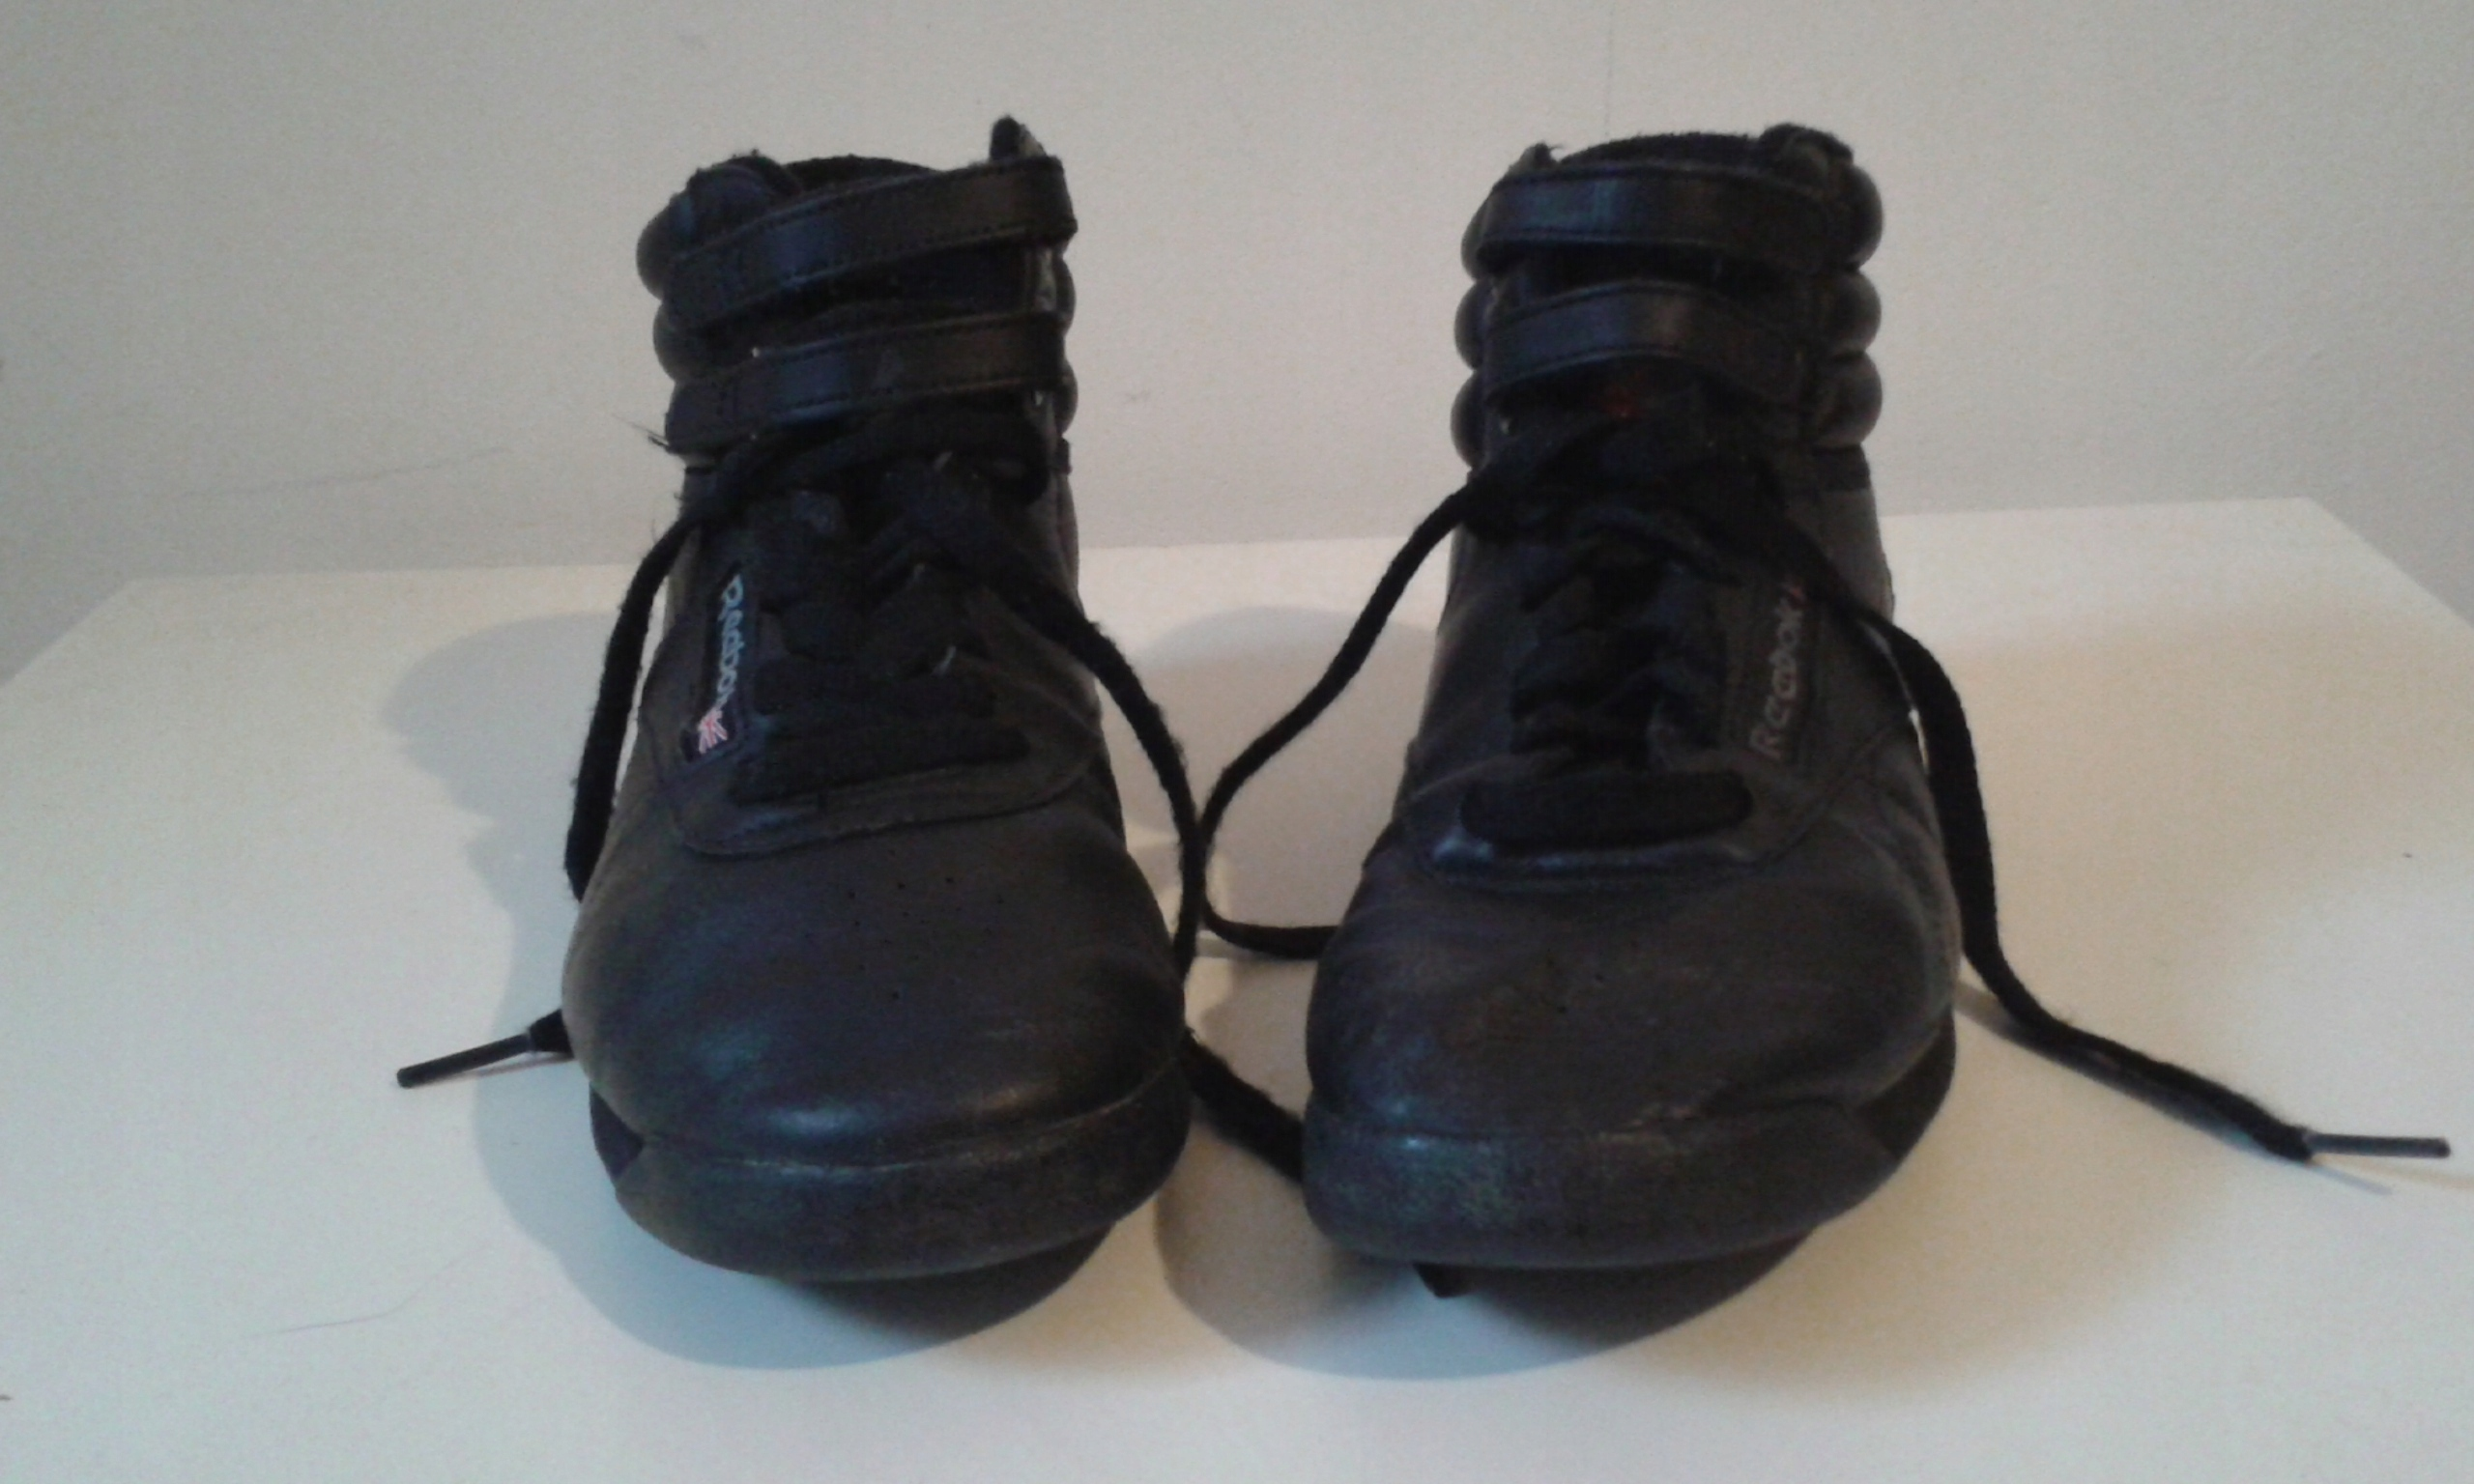 REEBOK CLASSIC buty za kostkę 38 (24,5 cm) skóra